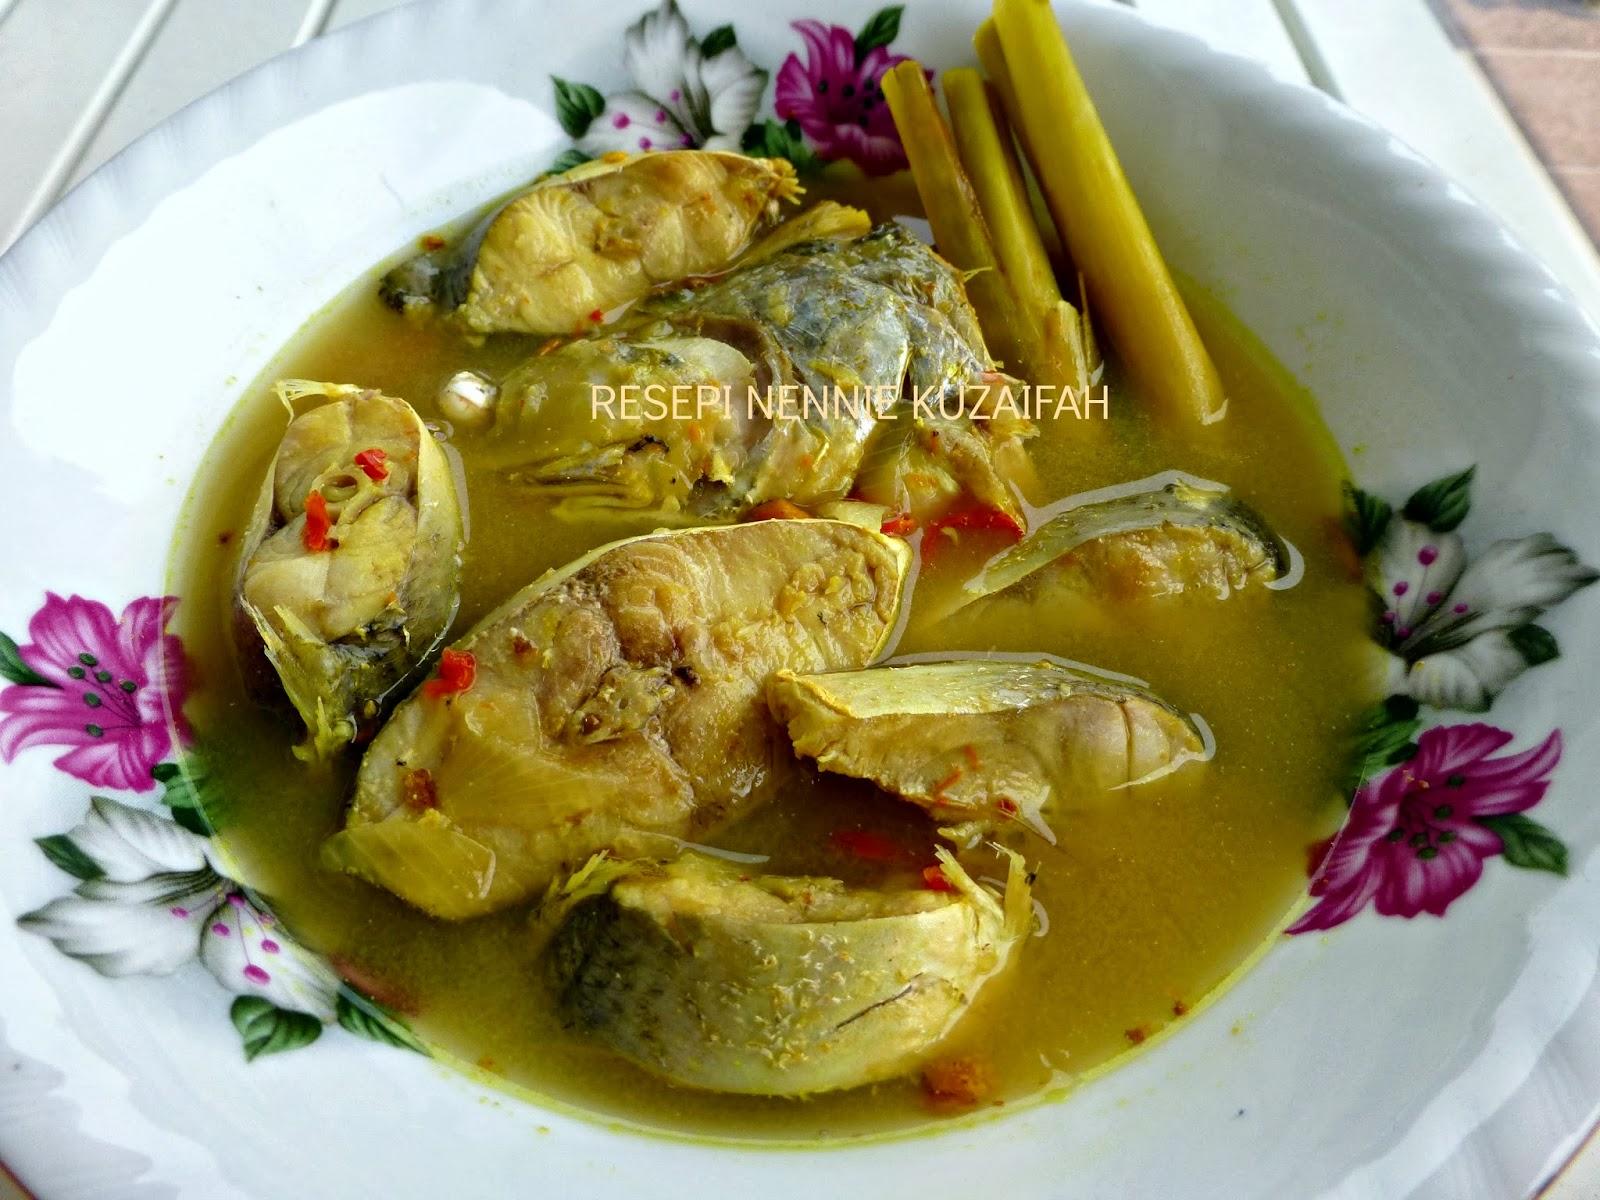 Resepi Ikan Senangin Bakar ~ Resep Masakan Khas